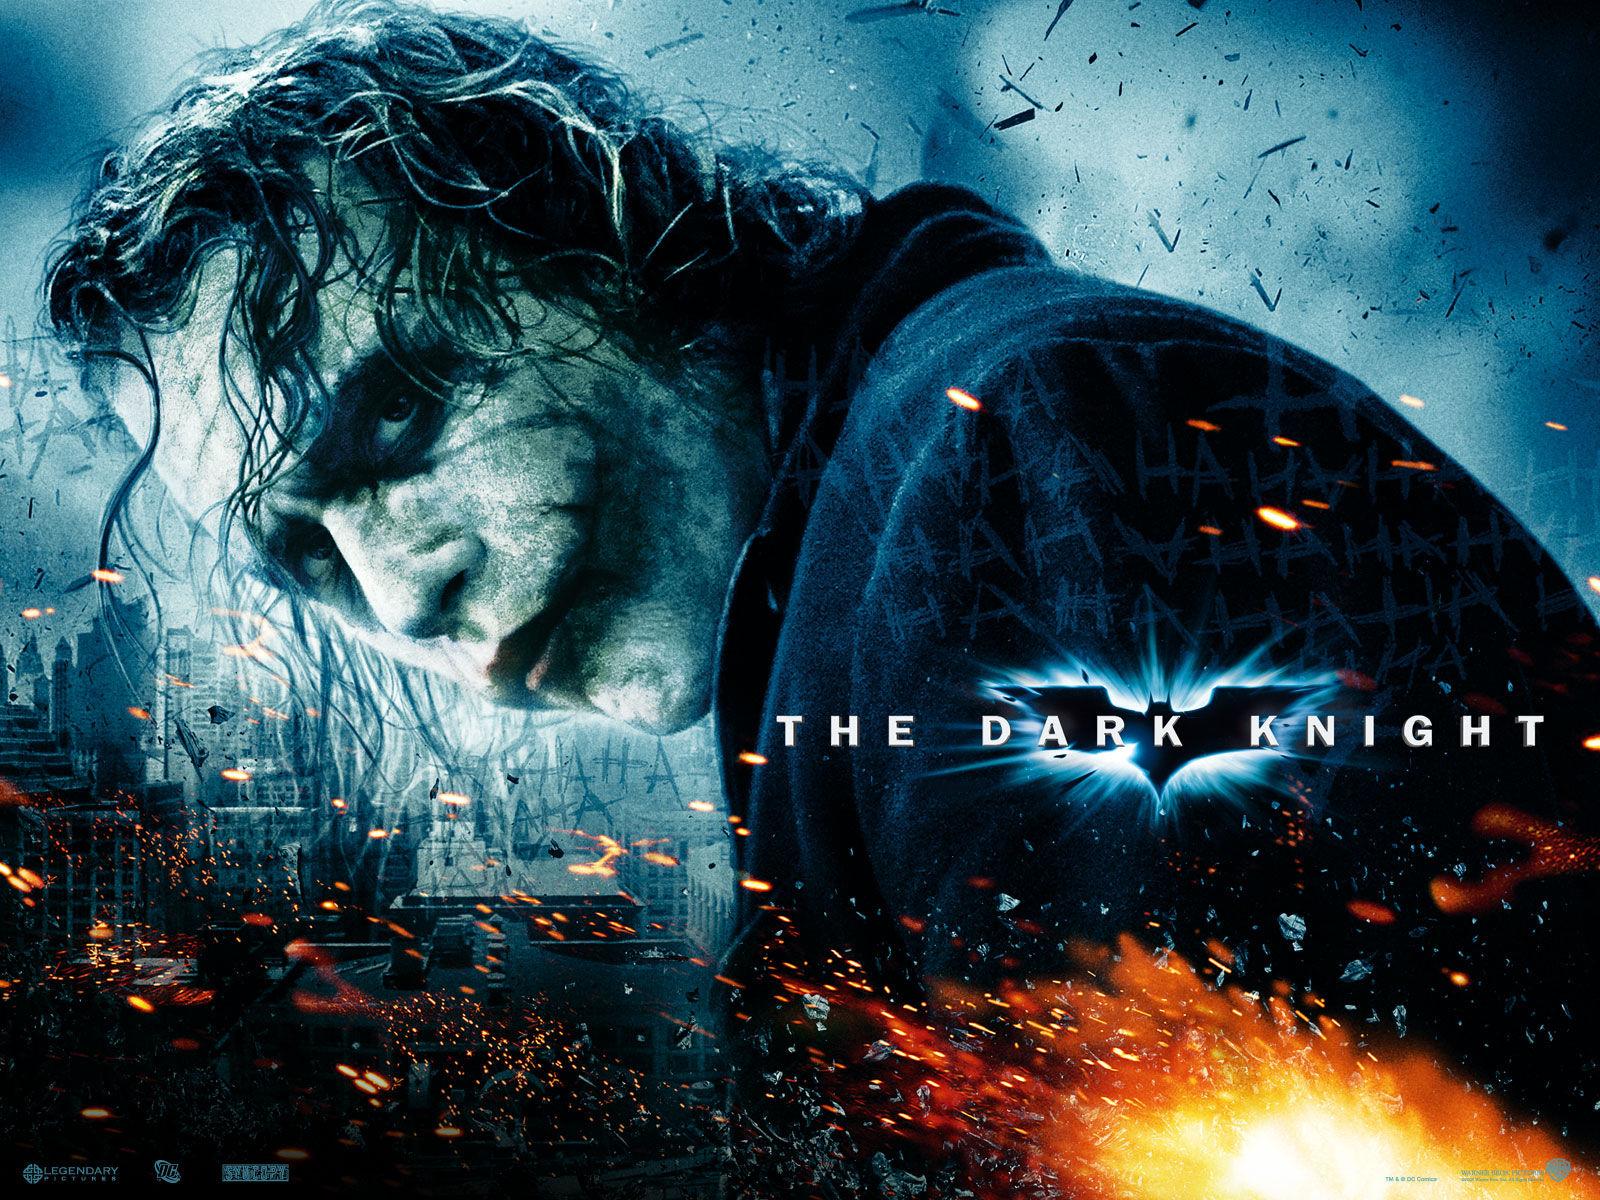 Joker The Dark Knight Wallpapers HD Wallpapers 1600x1200